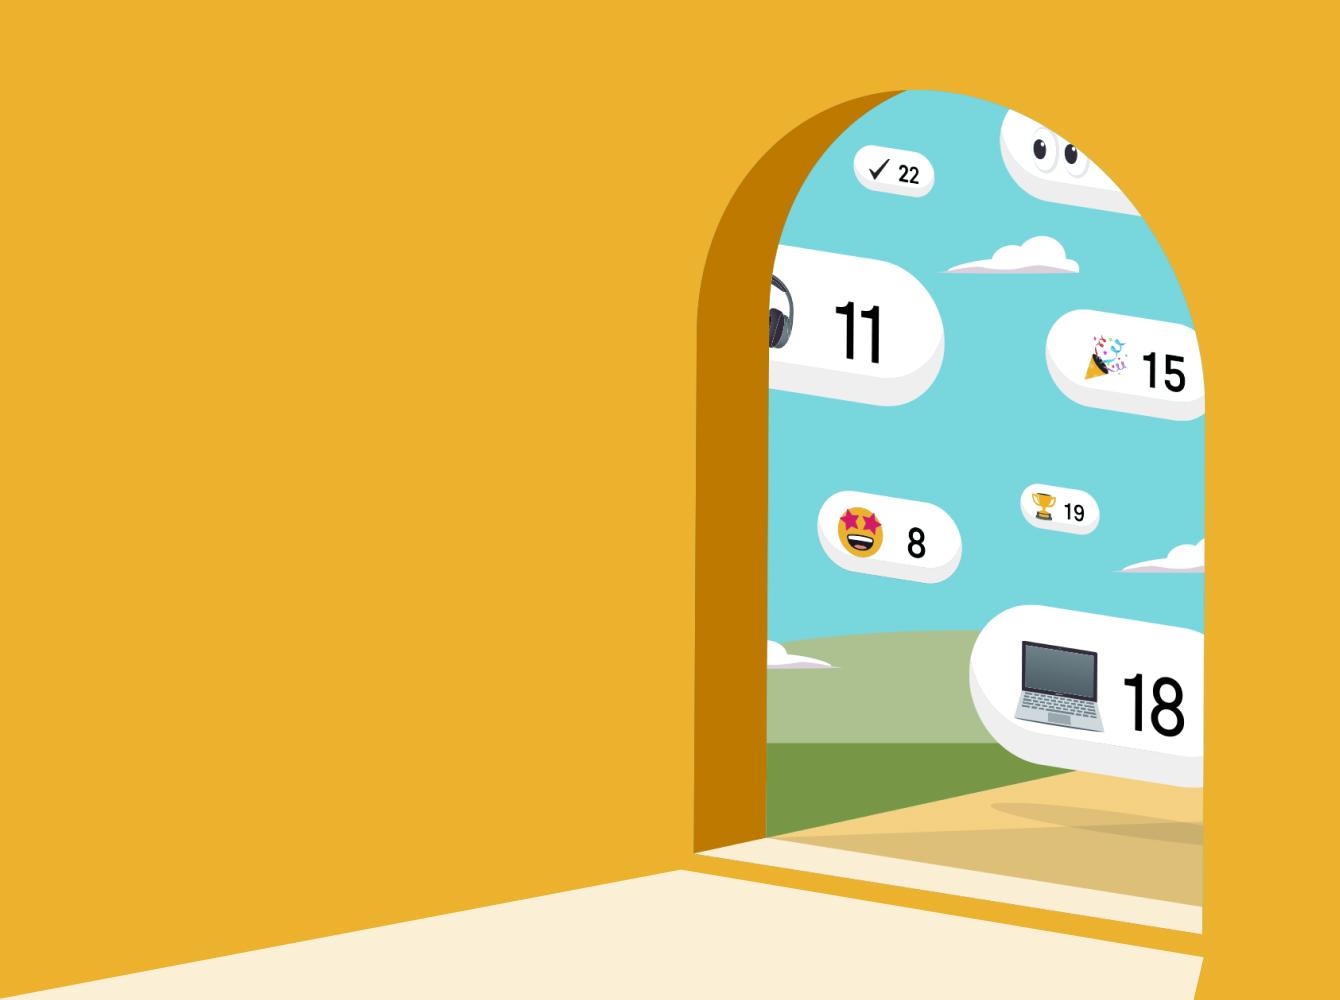 Door opening with clouds peaking through with Slack emojis